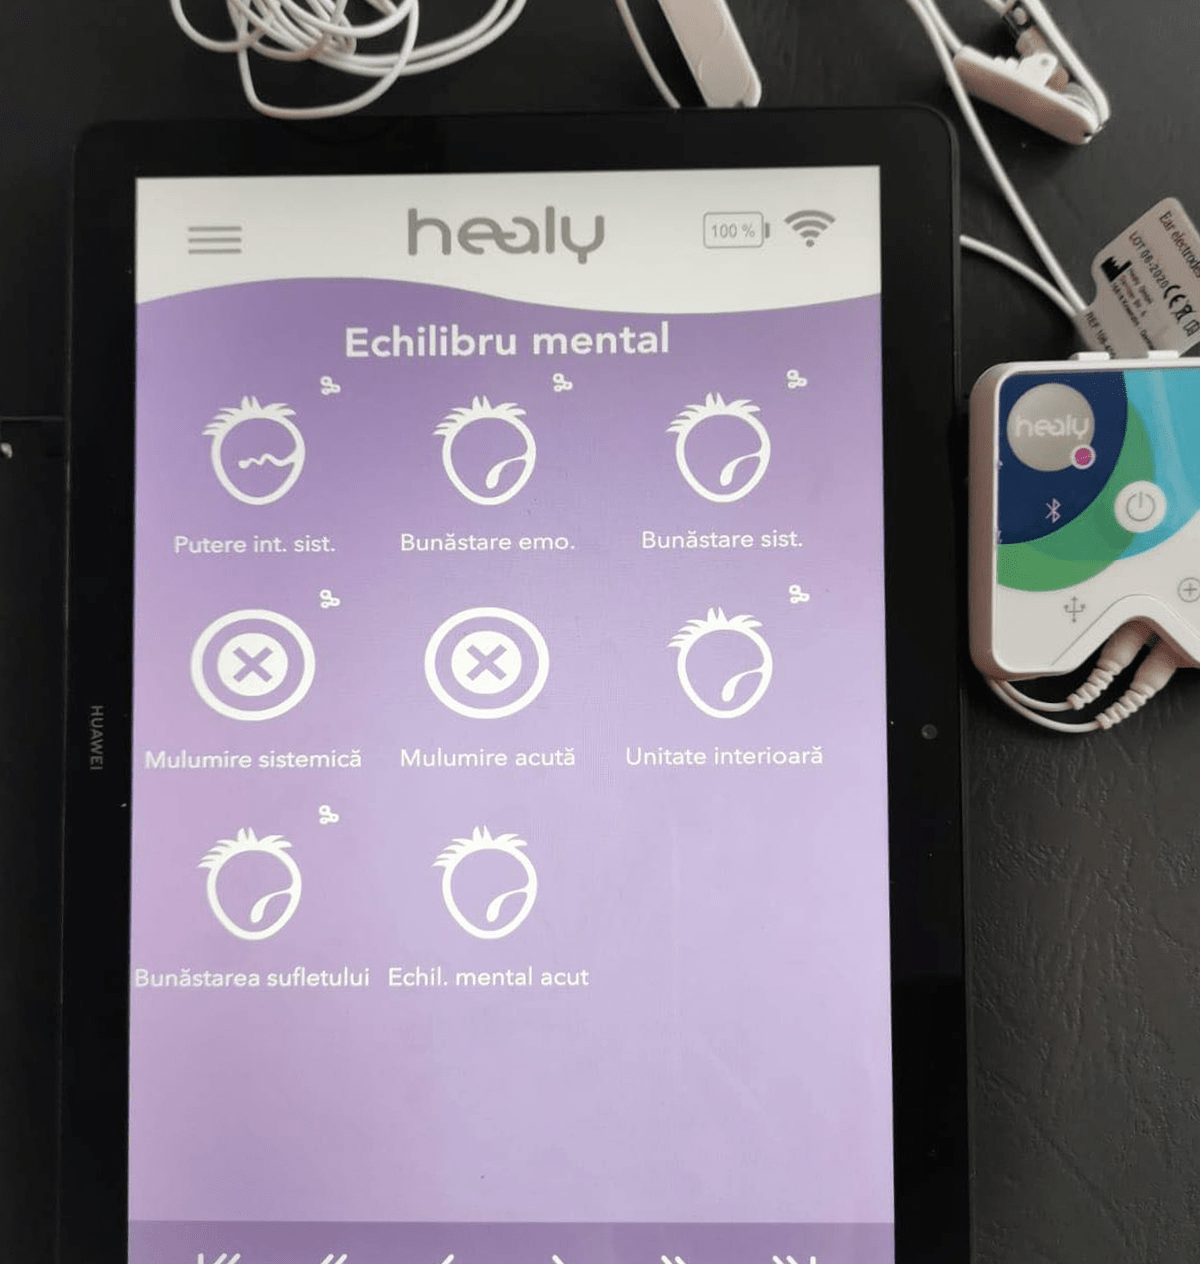 Healy - Sanatate si echilibru